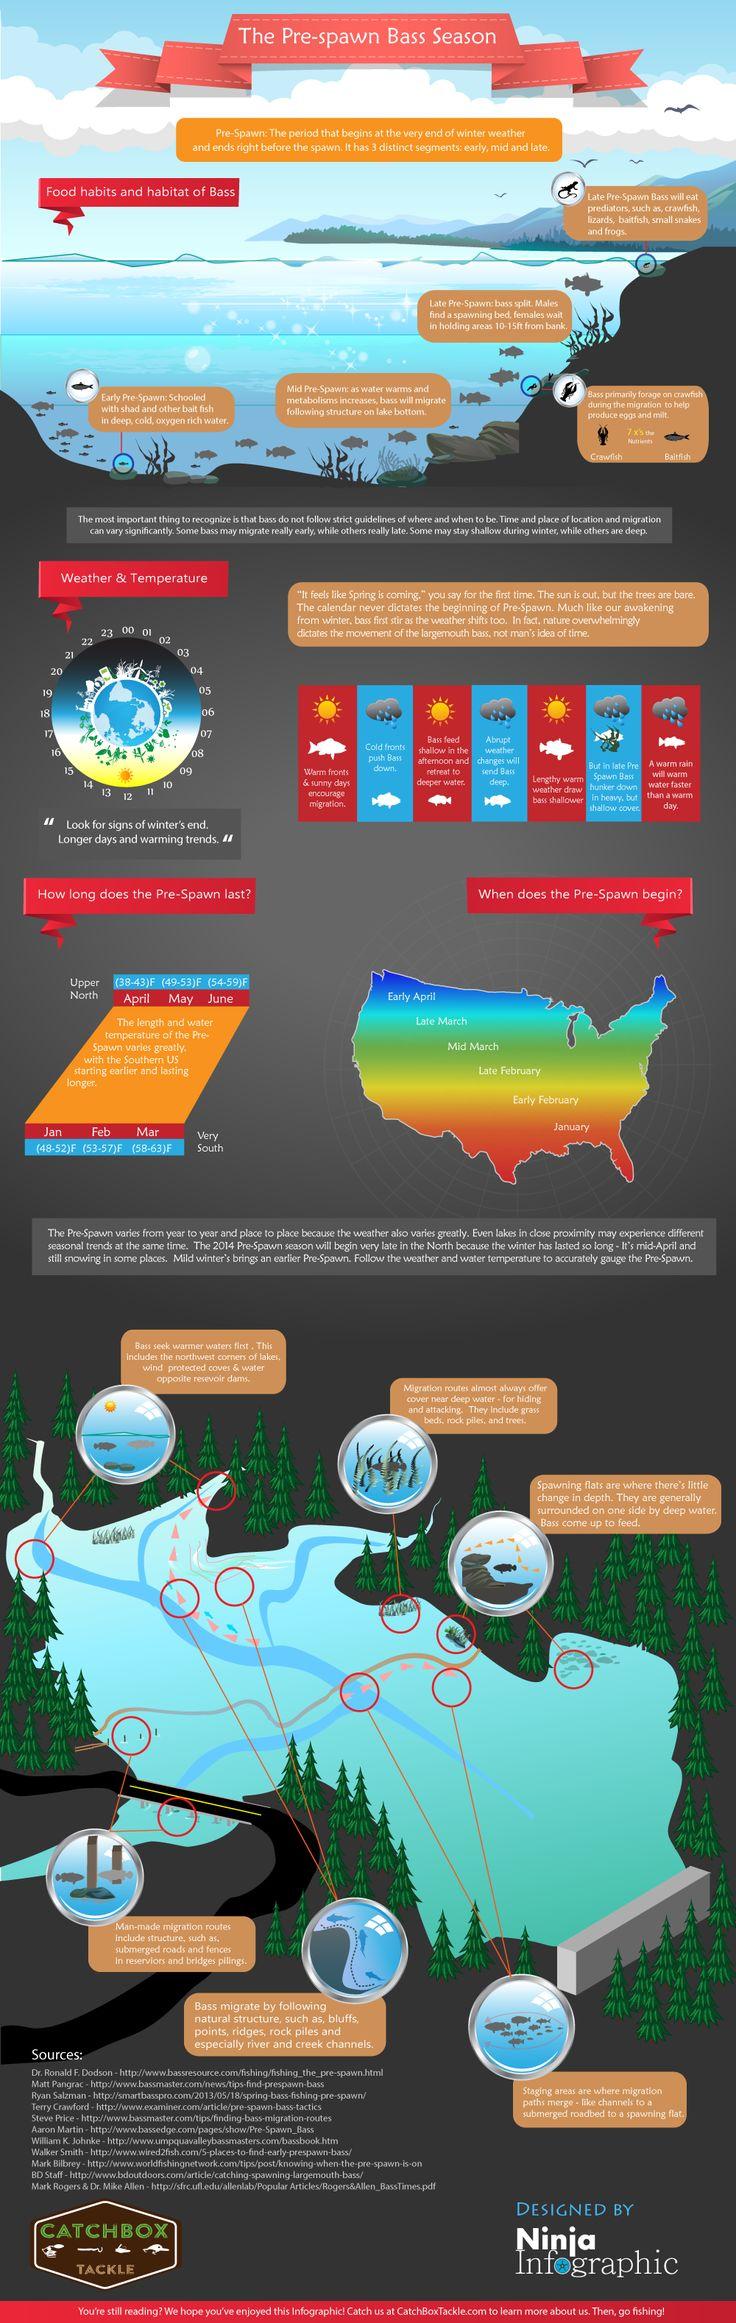 Pre Spawn Bass Season (Infographic) | Ninja Infographic